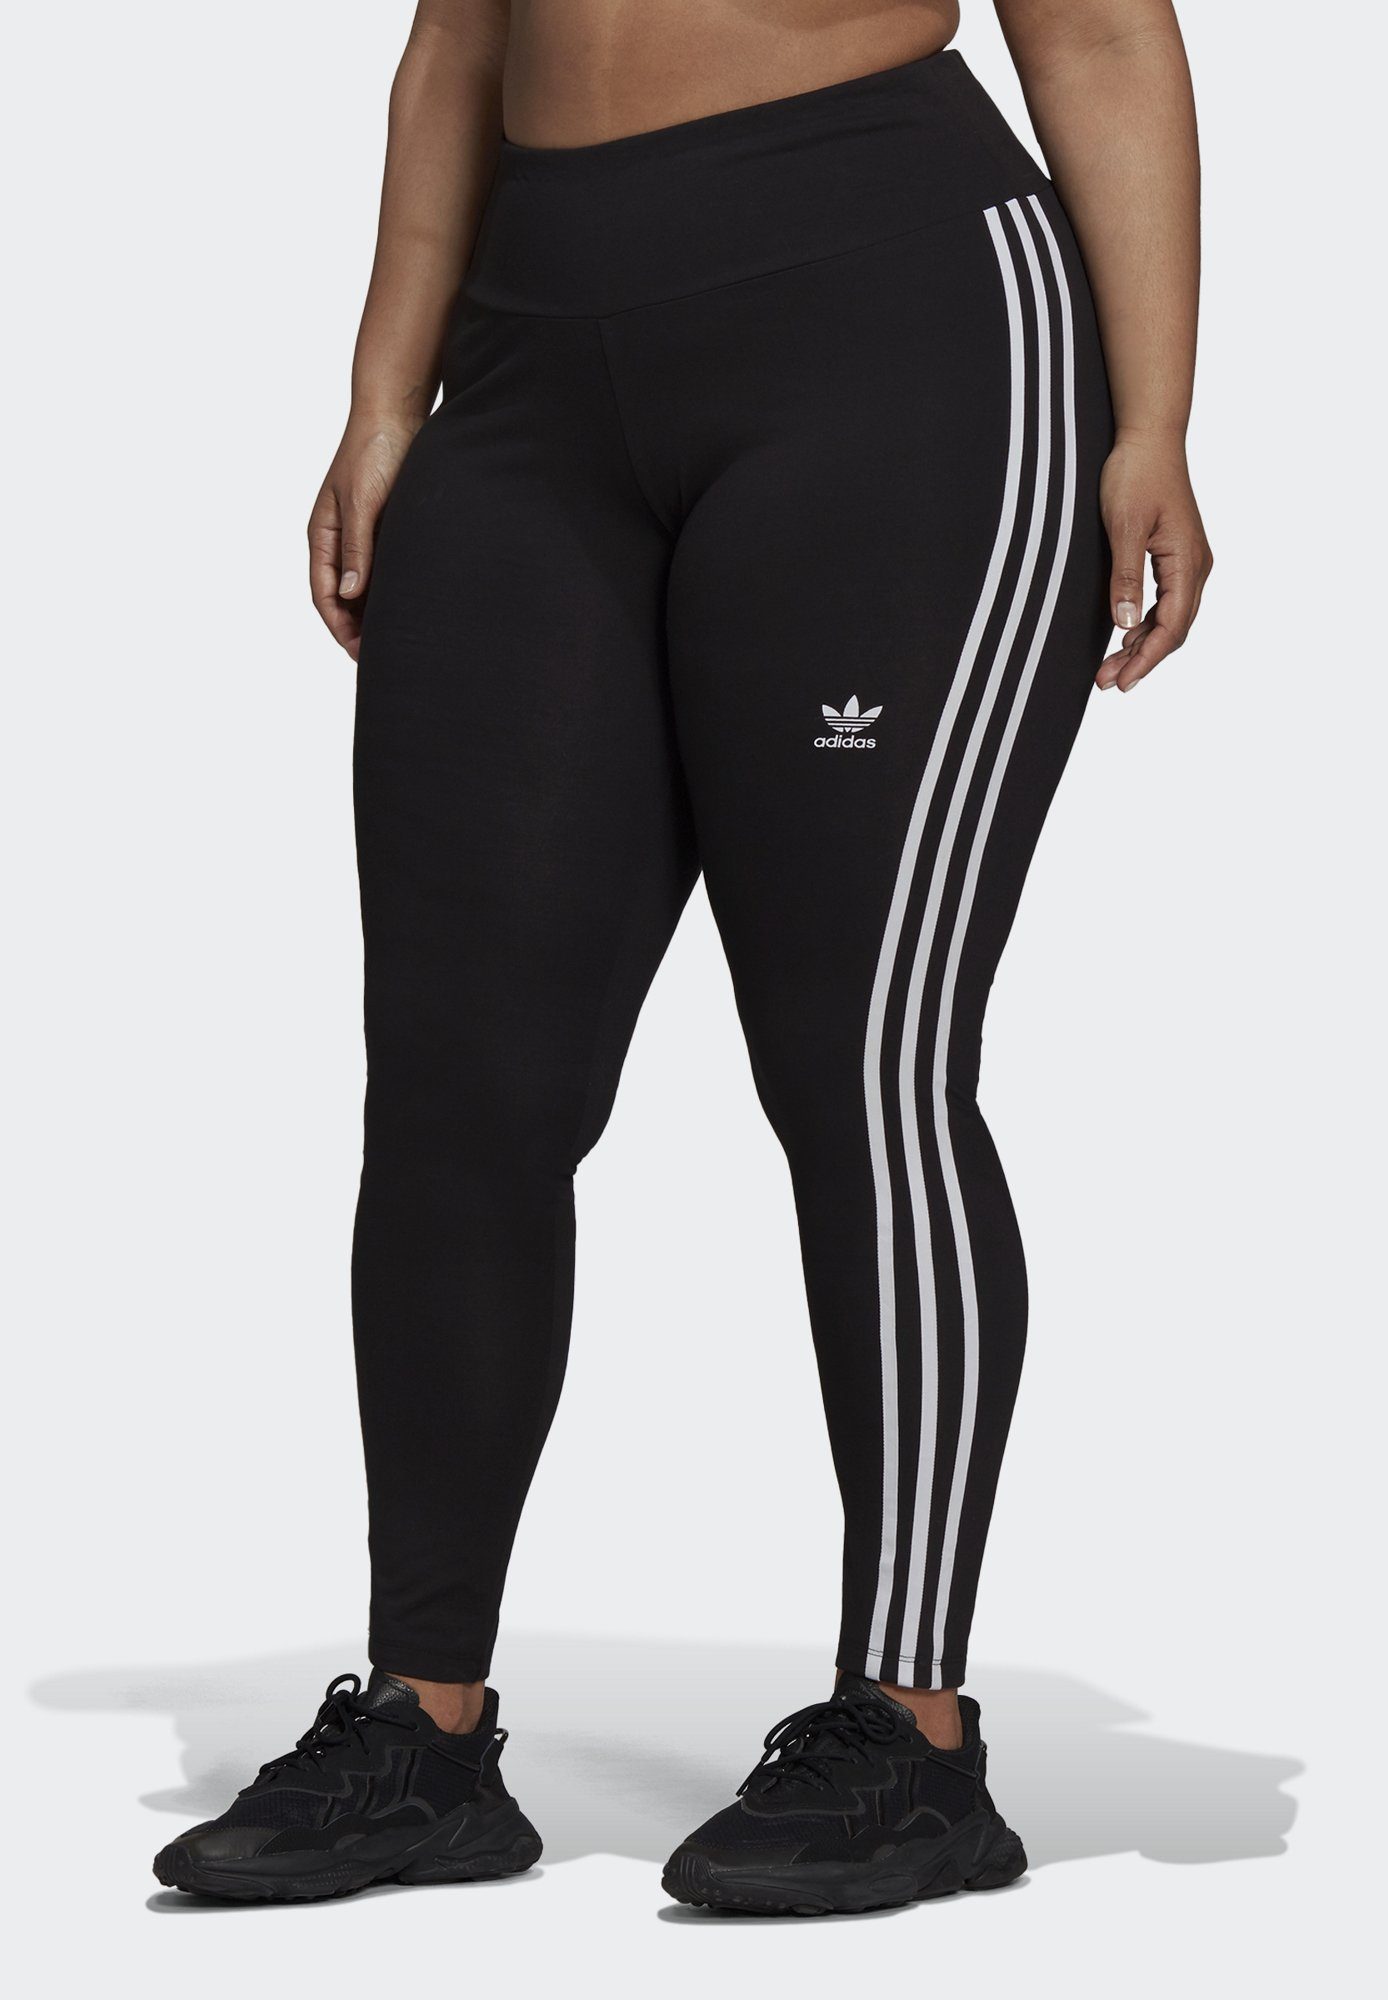 Women 3 STRIPES ADICOLOR COMPRESSION - Leggings - Trousers